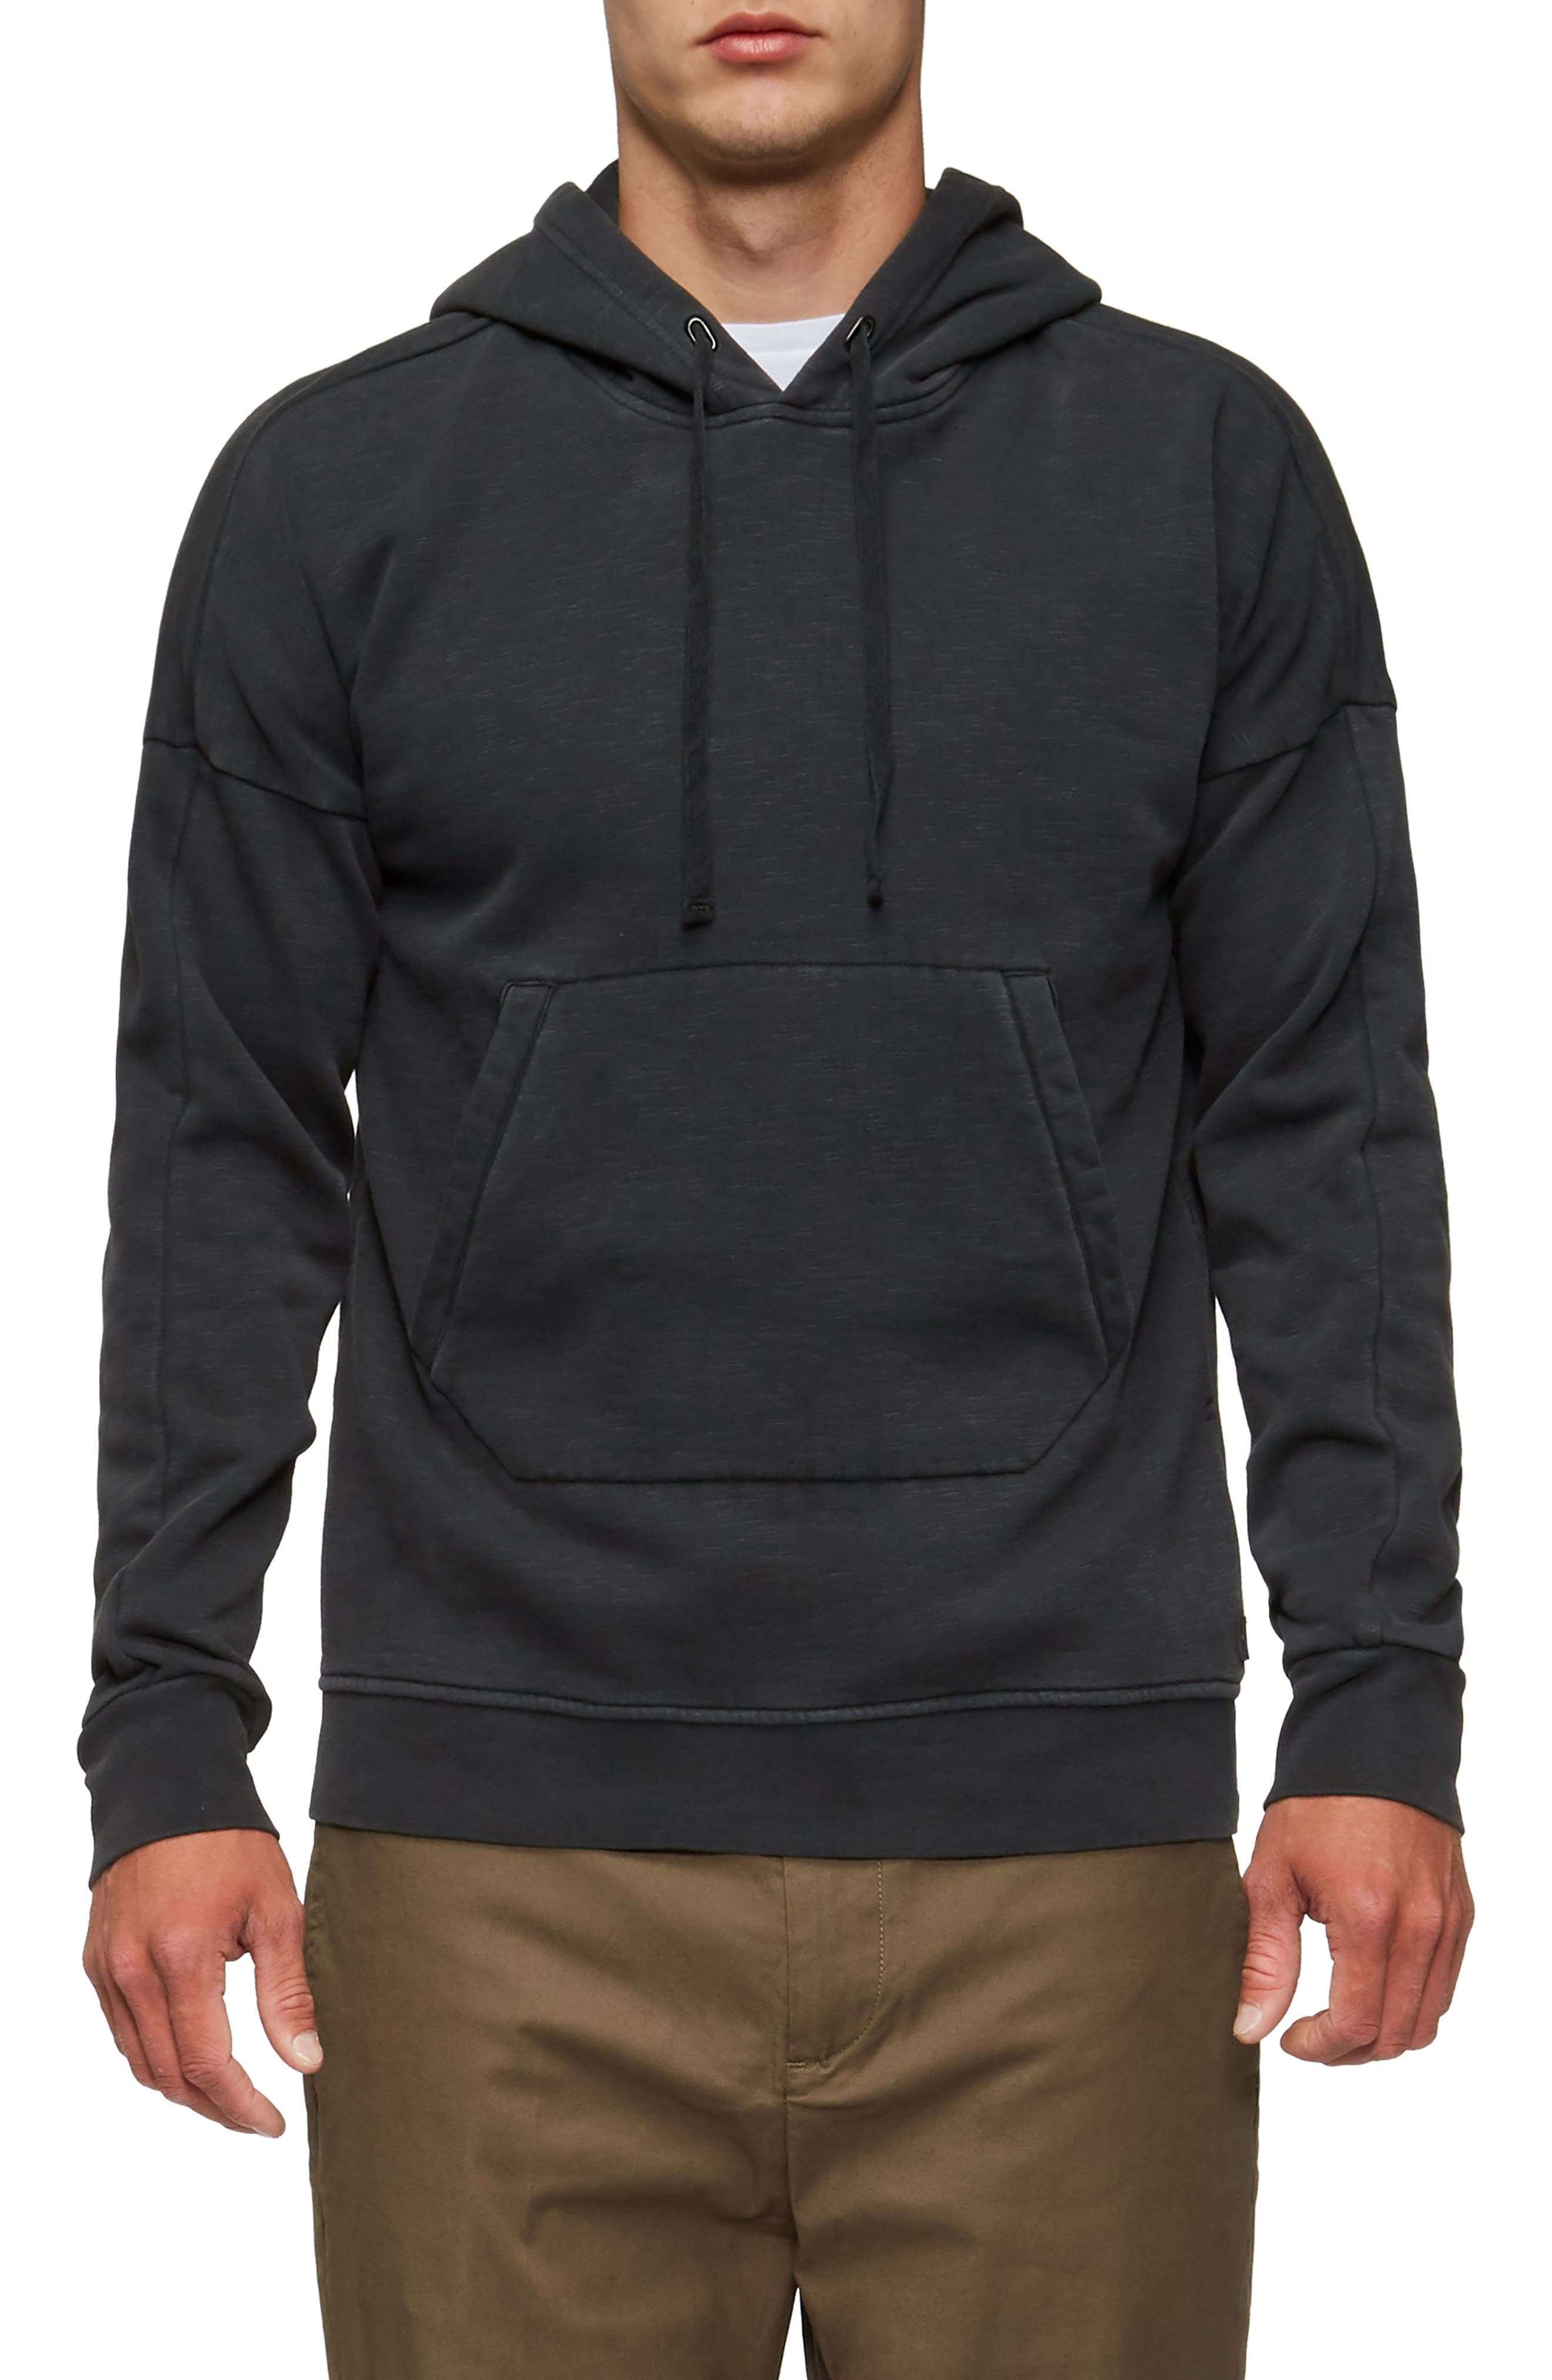 Turf Hooded Sweatshirt,                             Main thumbnail 1, color,                             Black